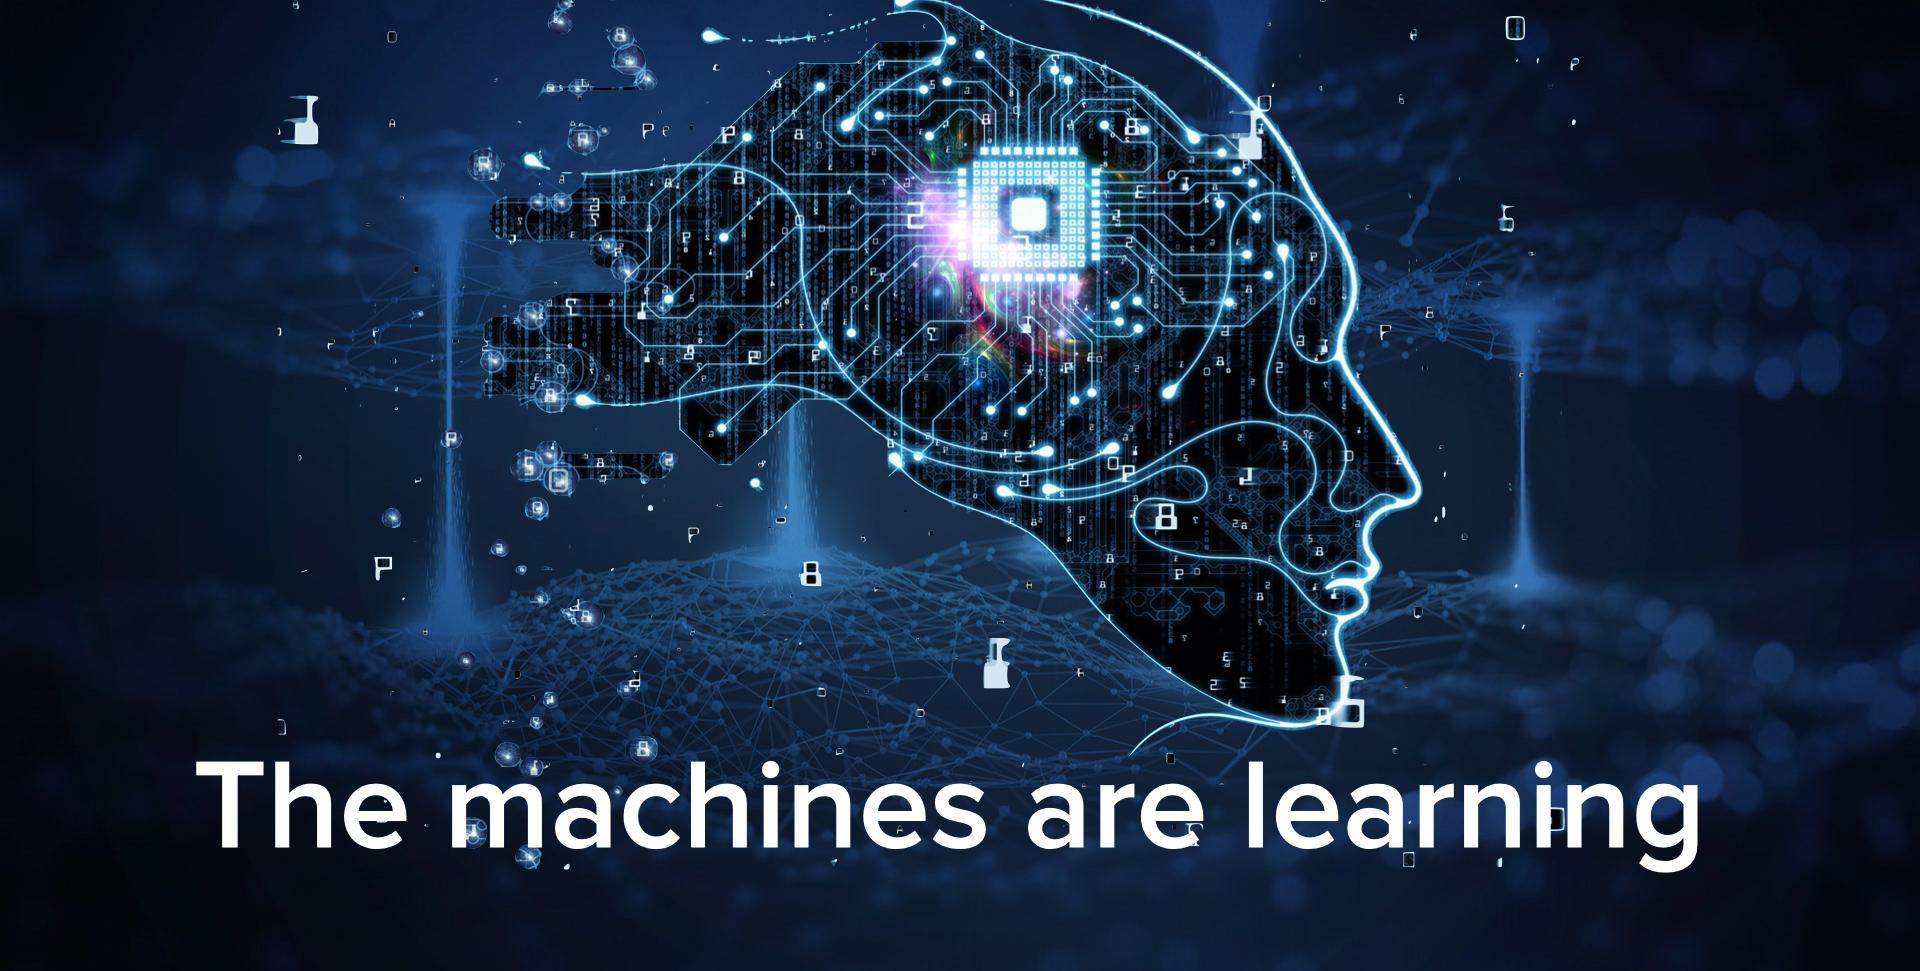 Illustration of machine learning